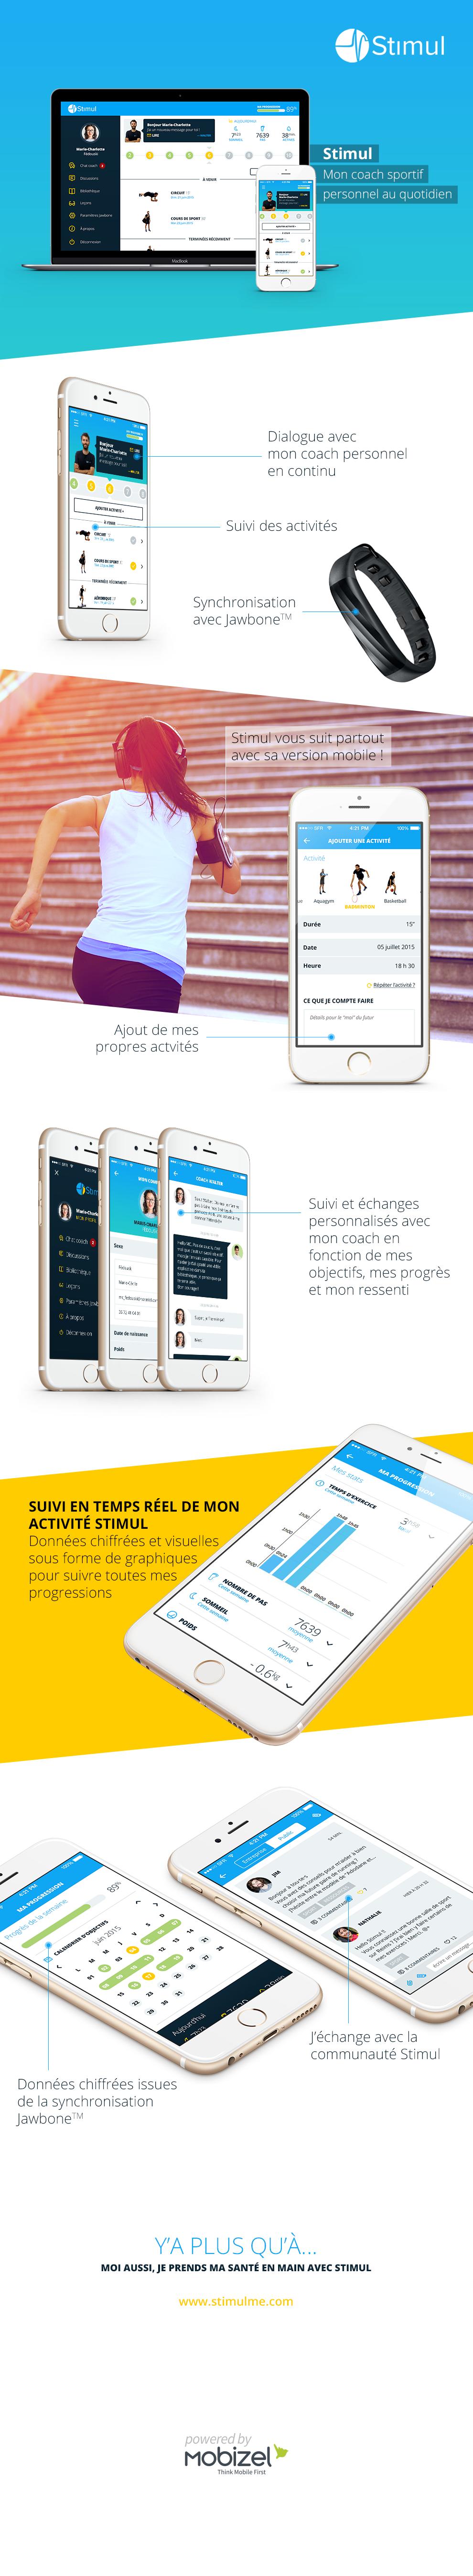 infographie-Stimul